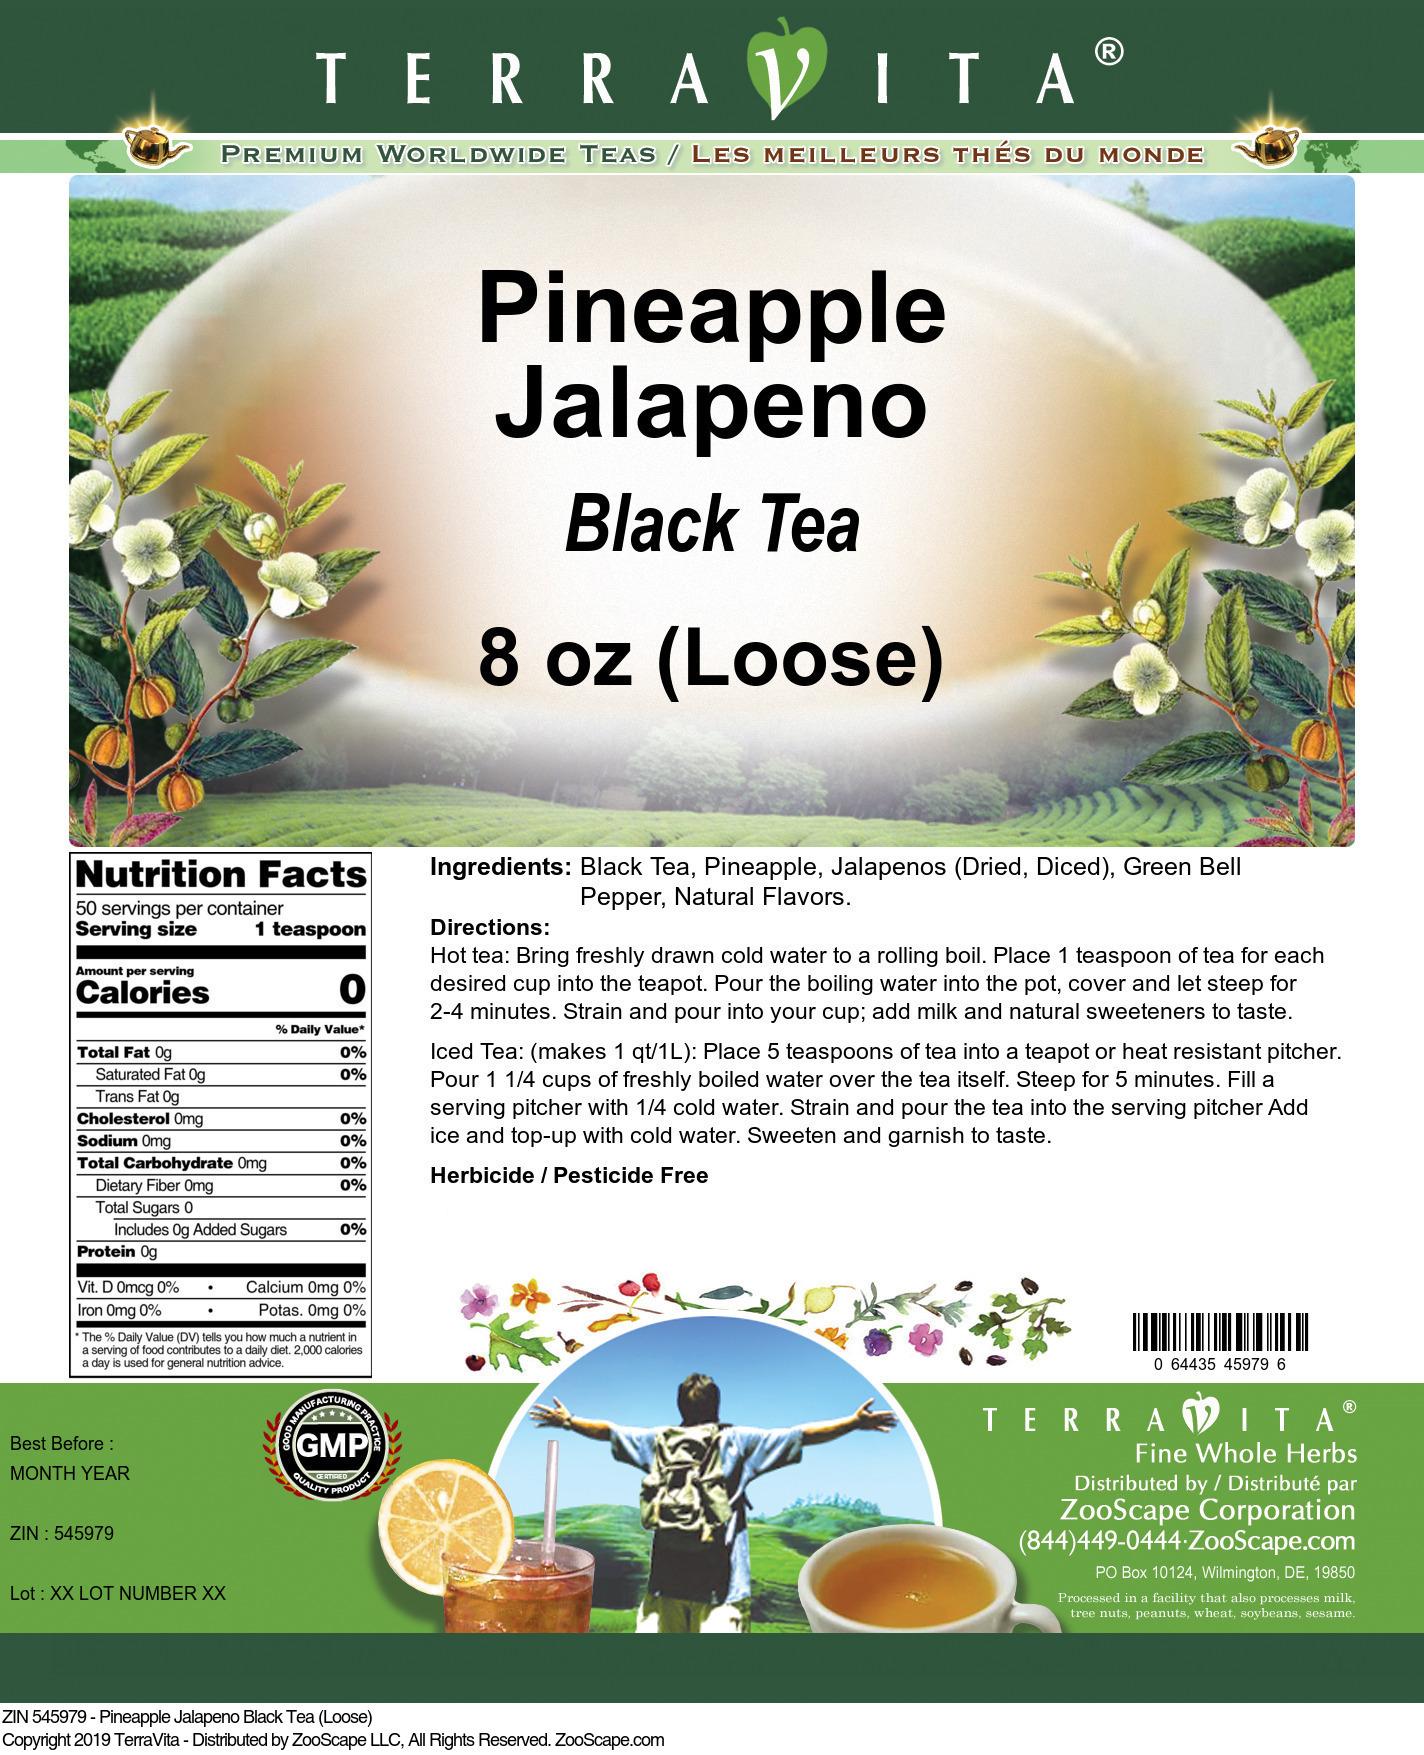 Pineapple Jalapeno Black Tea